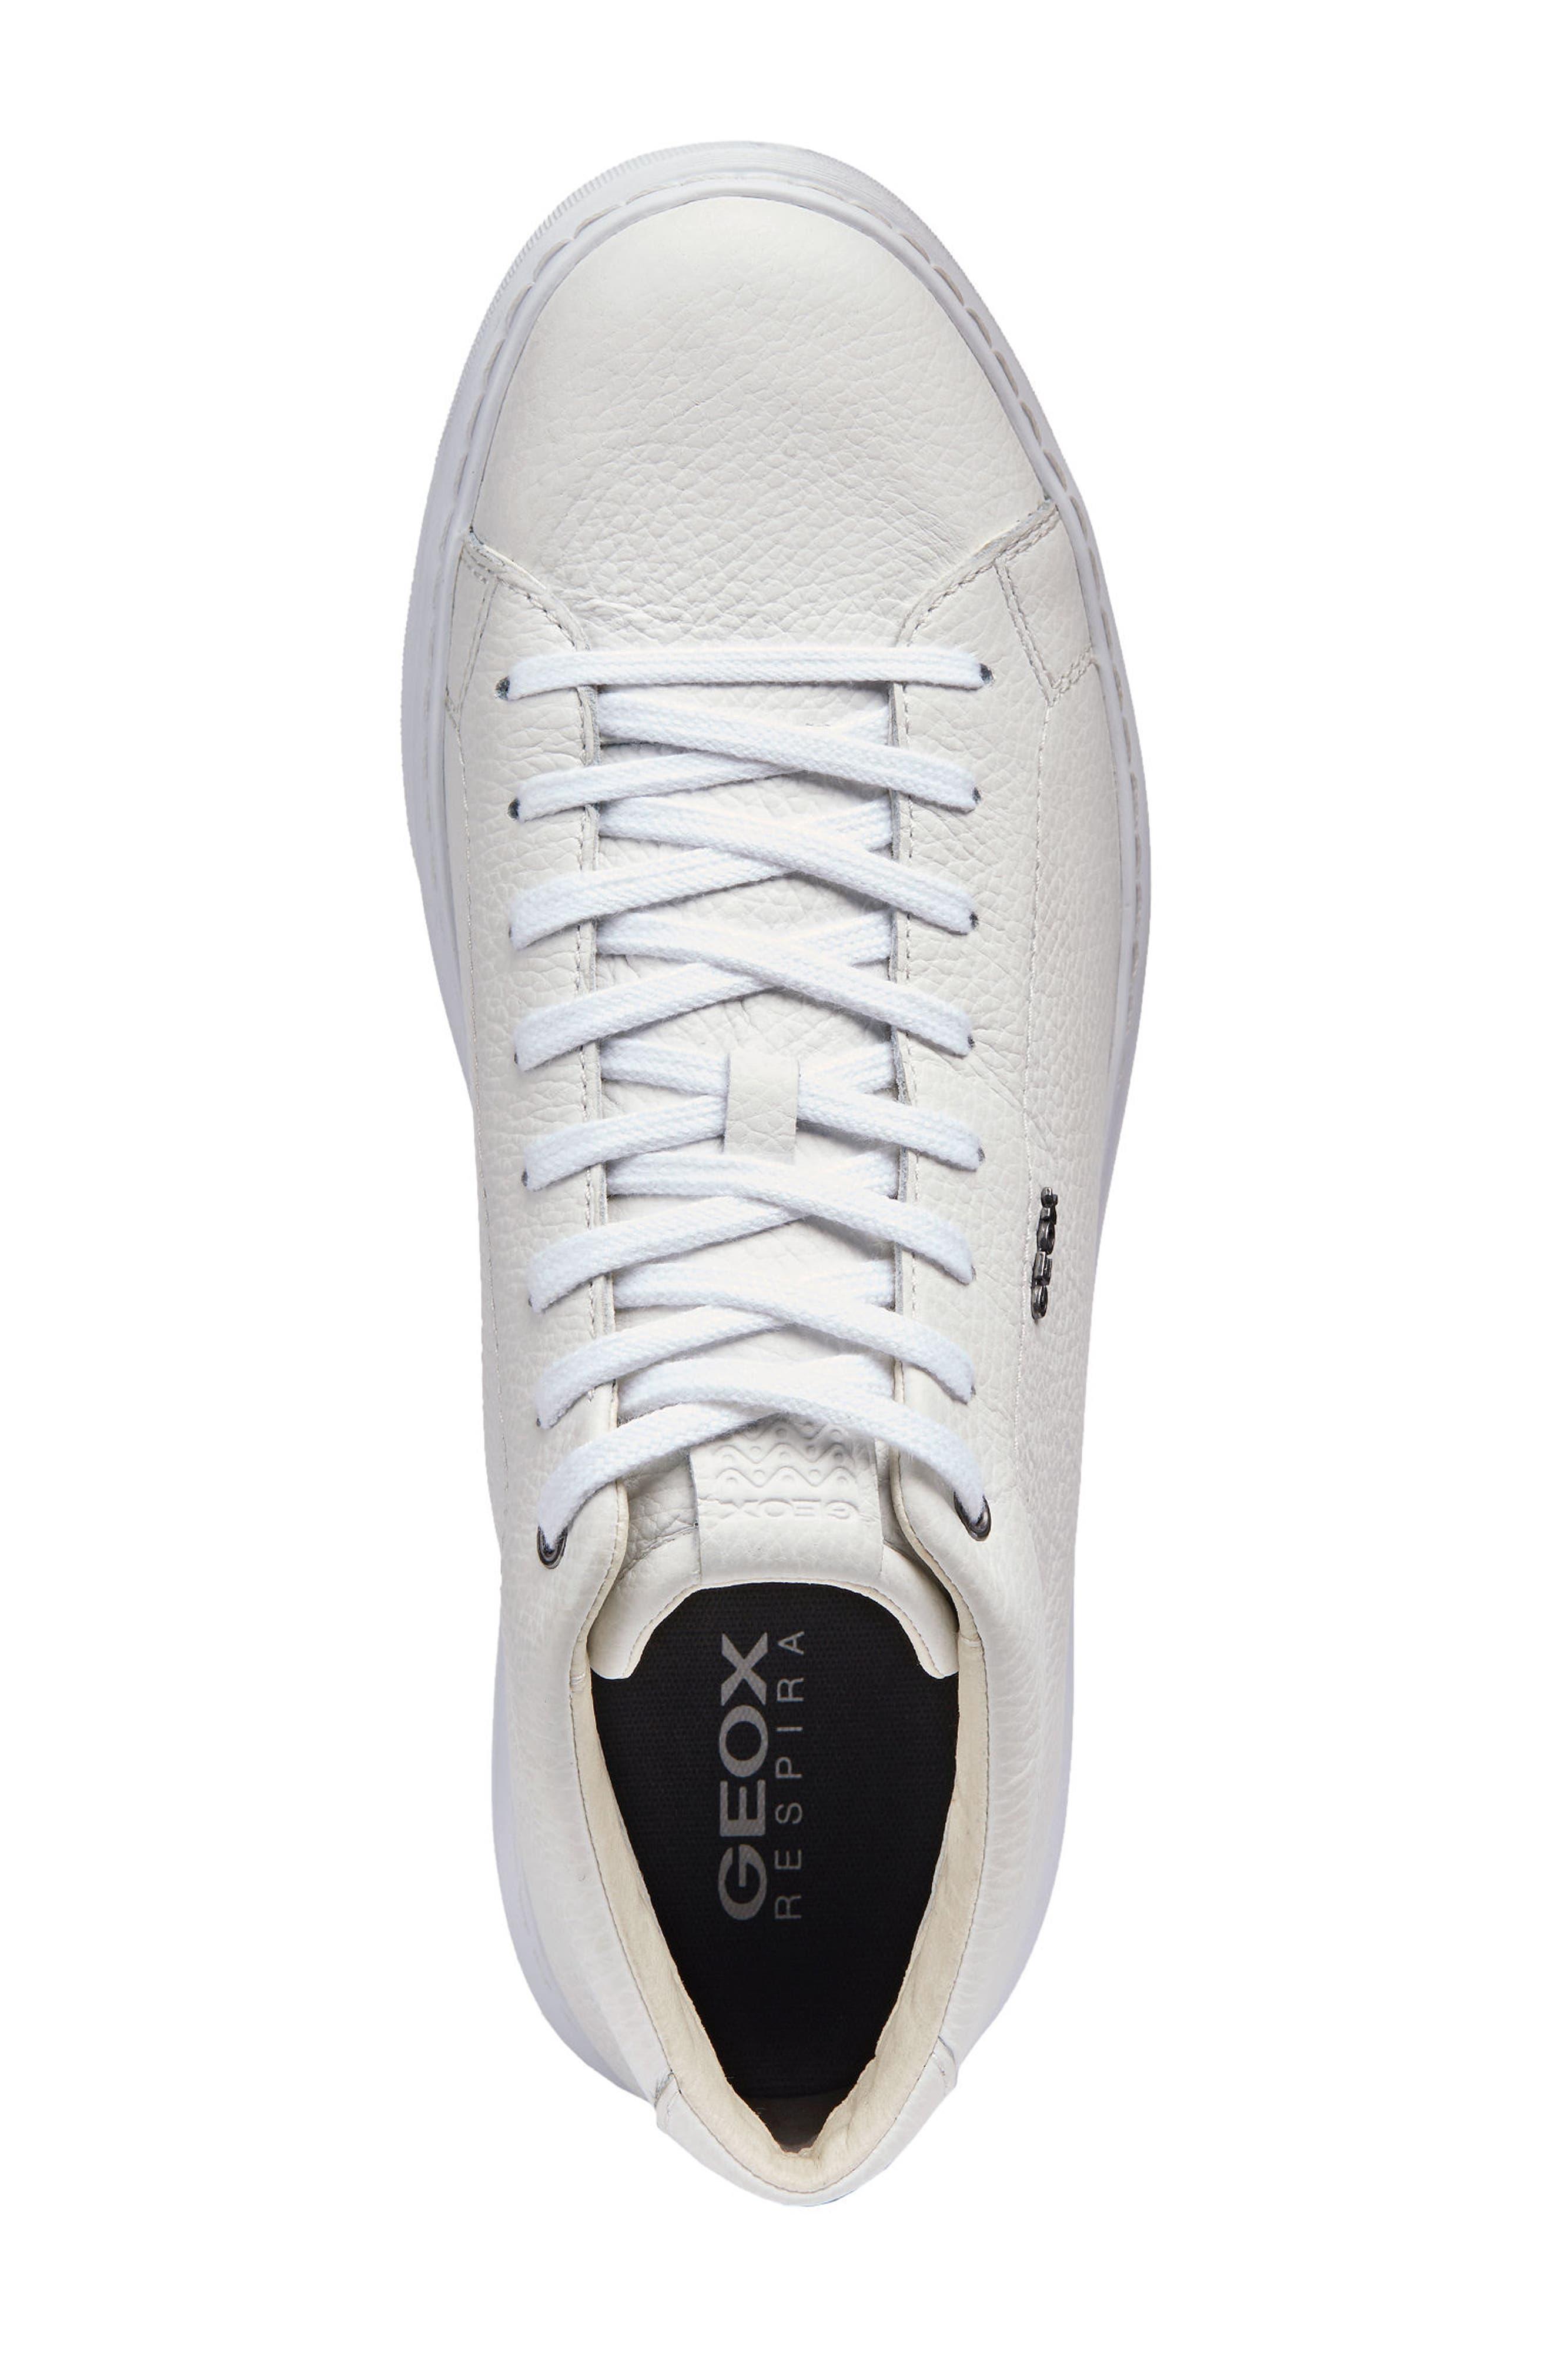 Deiven 3 Mid Top Sneaker,                             Alternate thumbnail 5, color,                             100